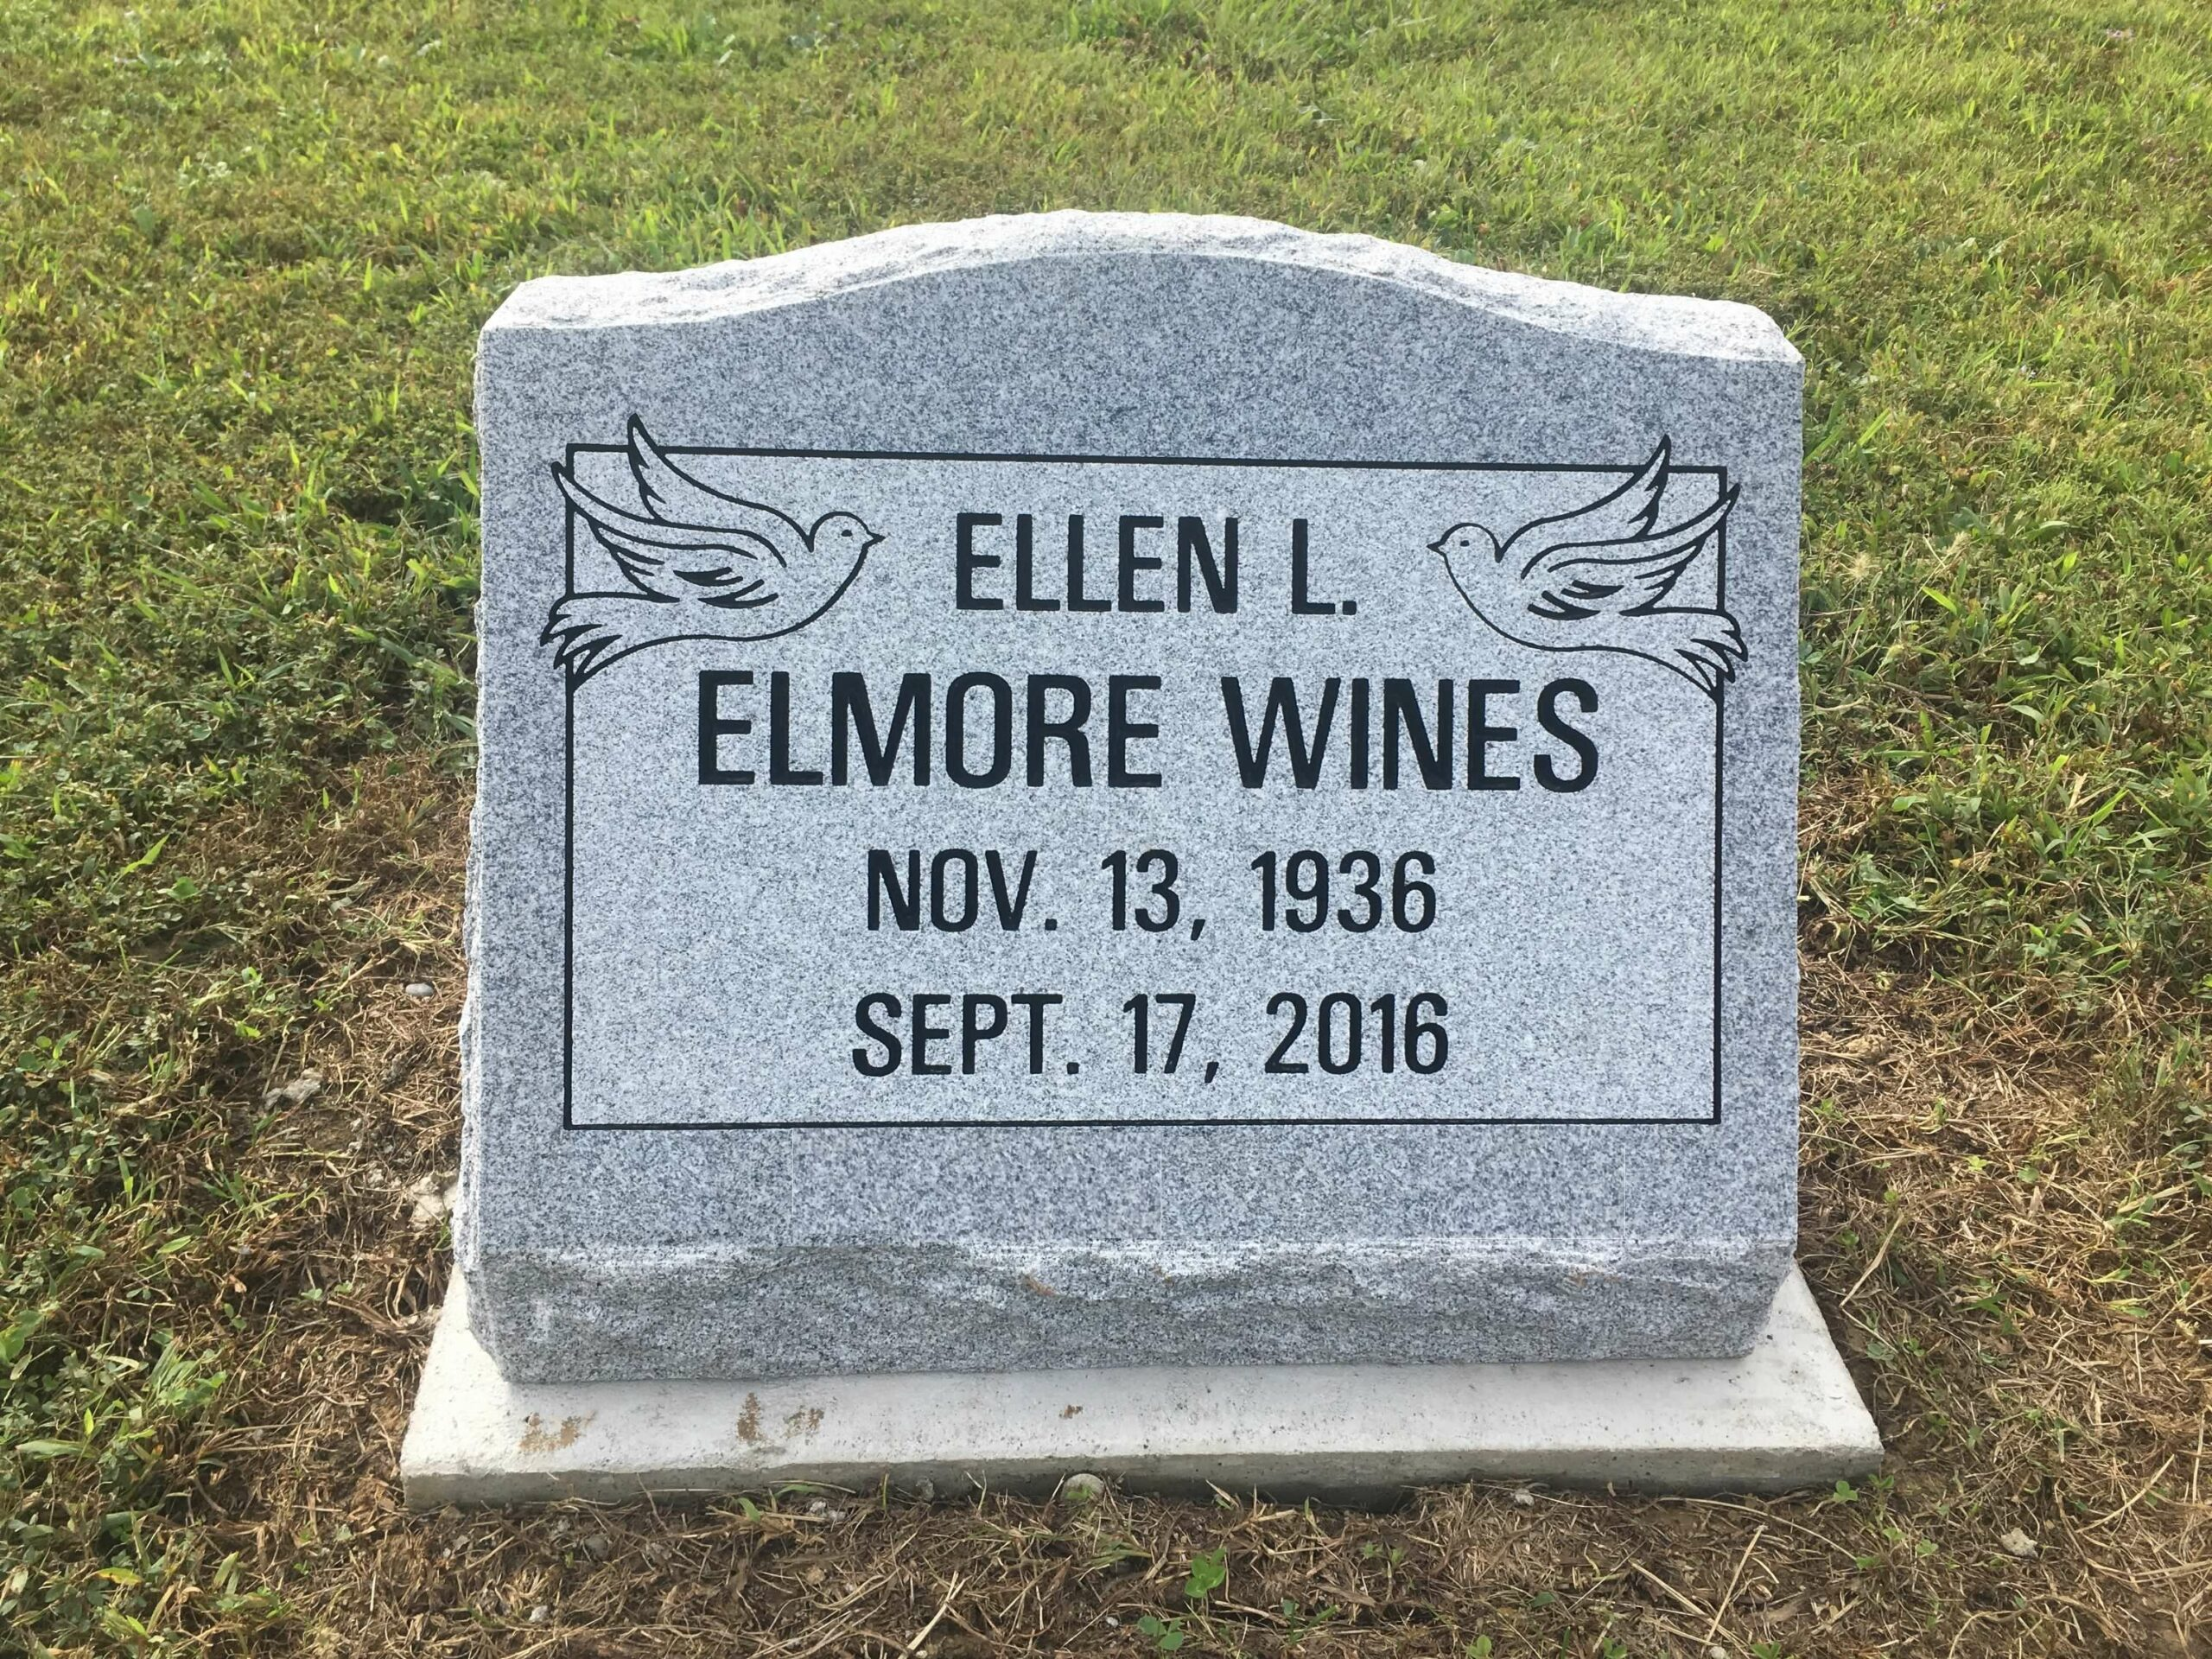 Wines, Ellen L. Elmore - Iliff Cem., 1-8, Gray